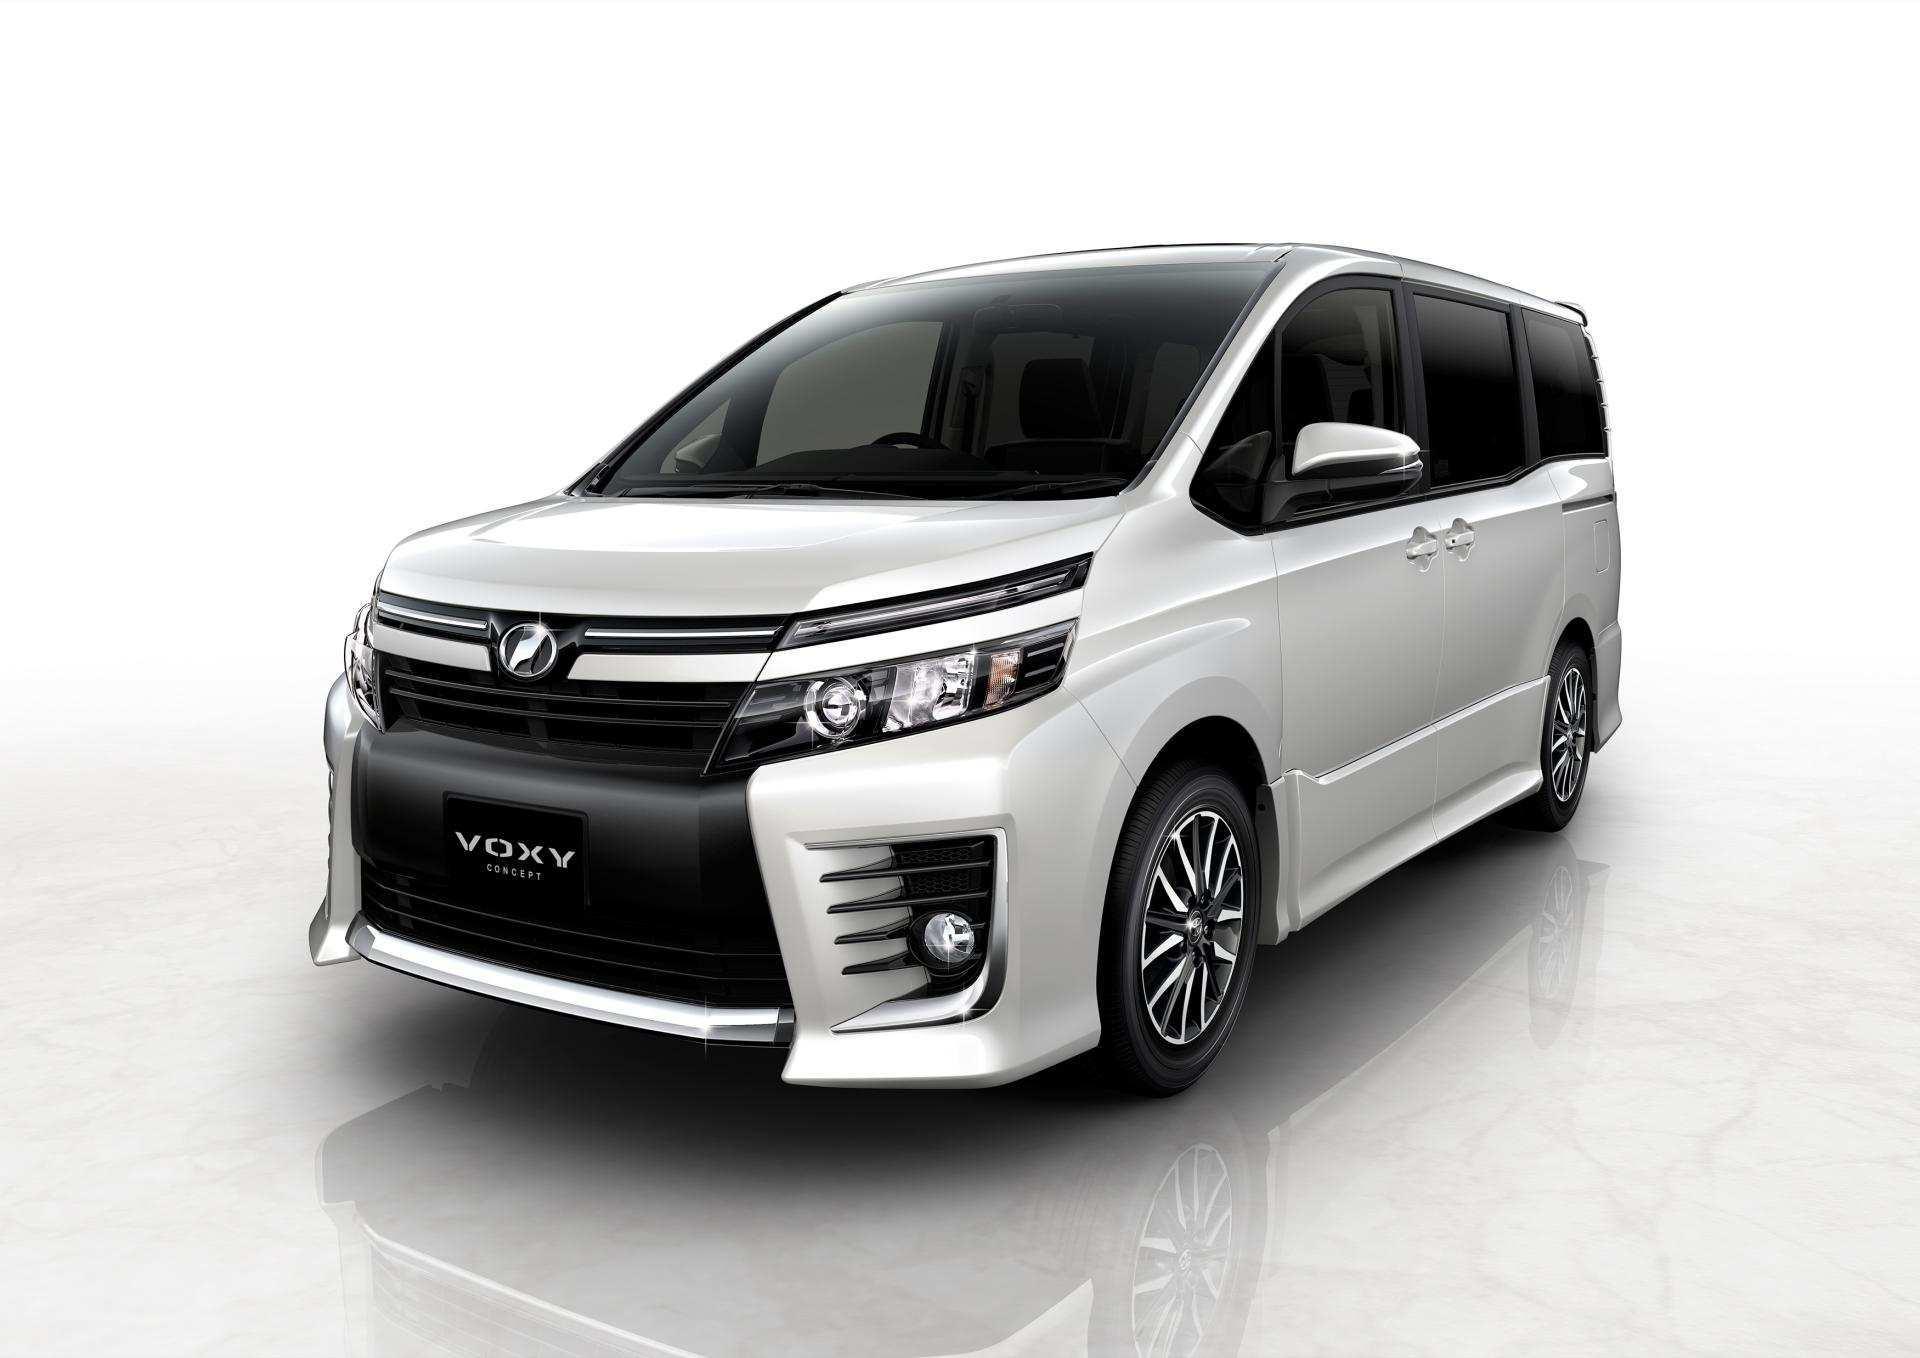 87 New Toyota 2020 Van History by Toyota 2020 Van